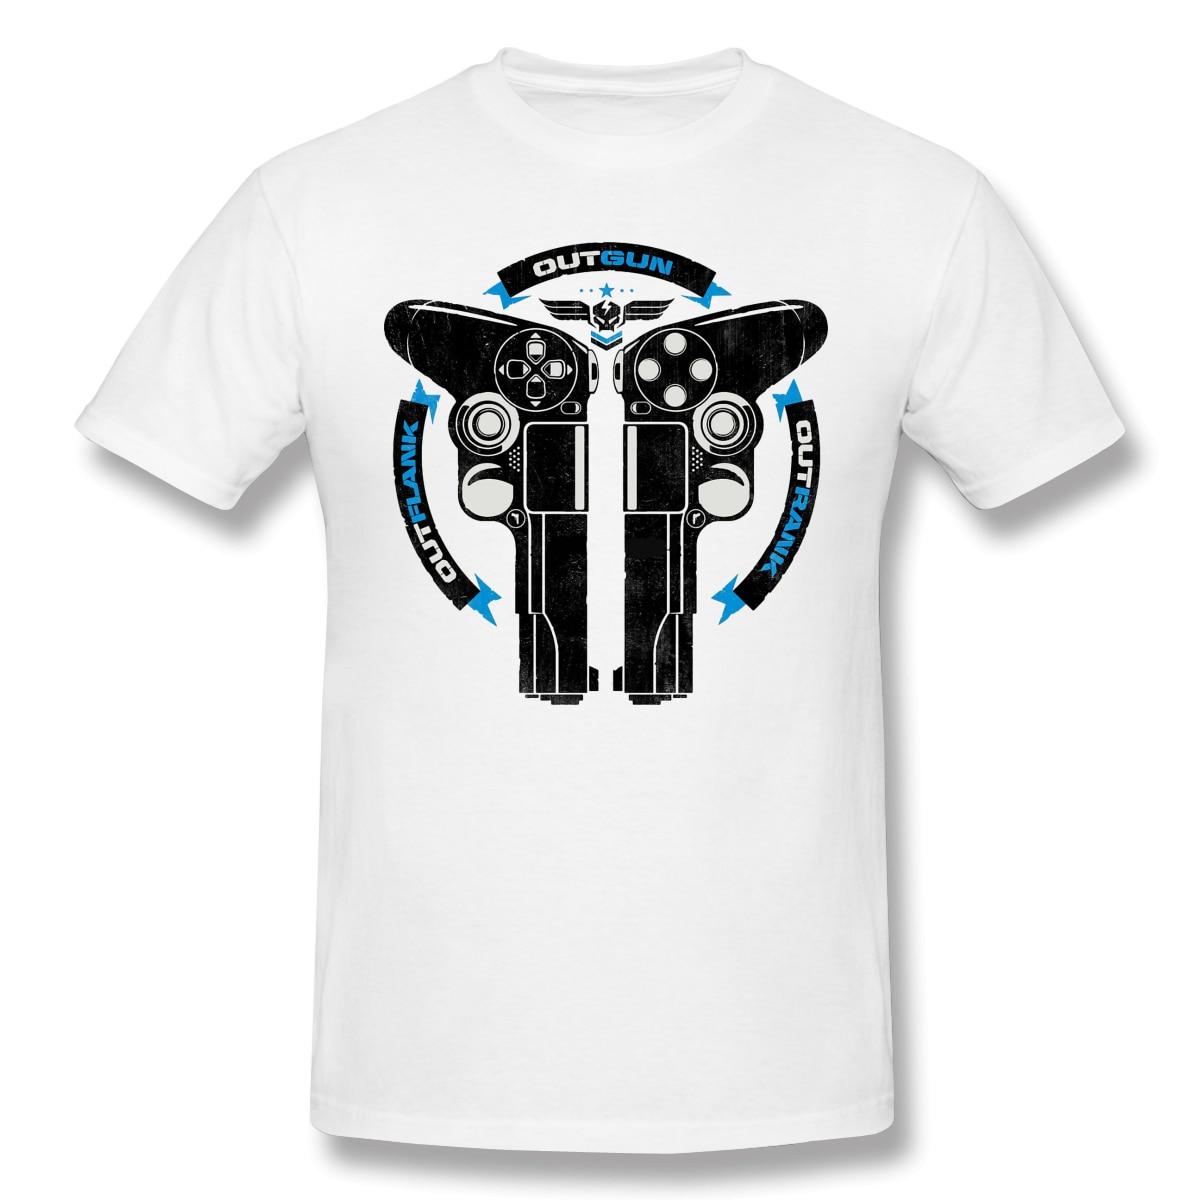 FPS Life PS editiont-shirt hombres de alta calidad 100% de algodón de manga corta de verano de llamada de servicio Casual camiseta suelta